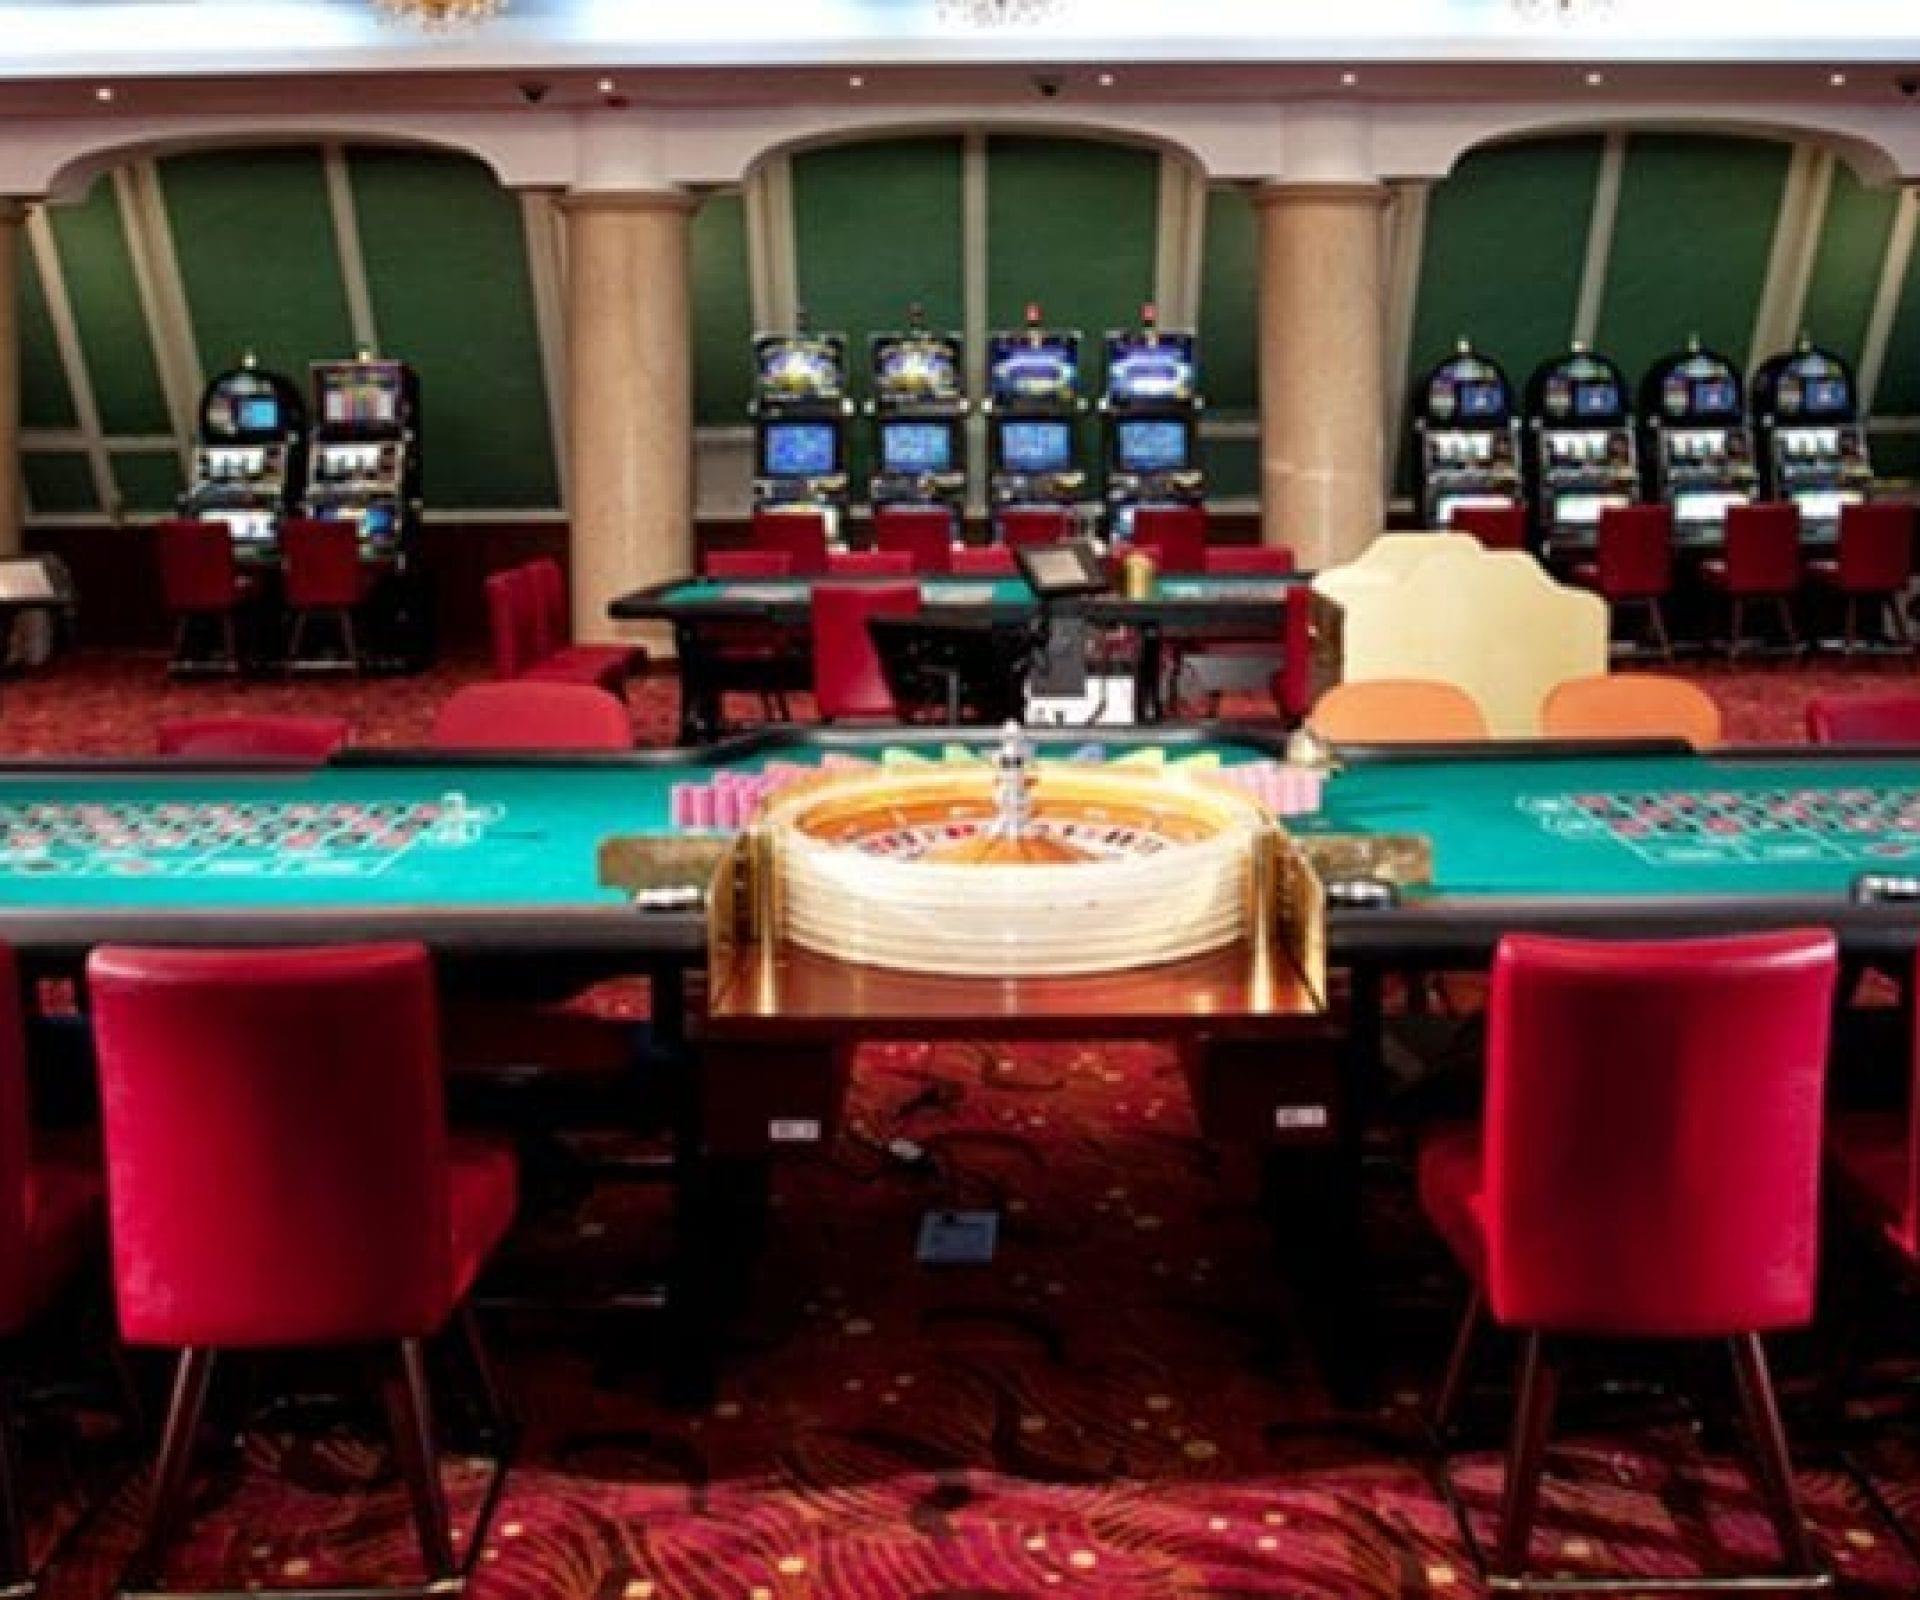 Daegu Casino at Hotel Inter-Burgo | Daegu